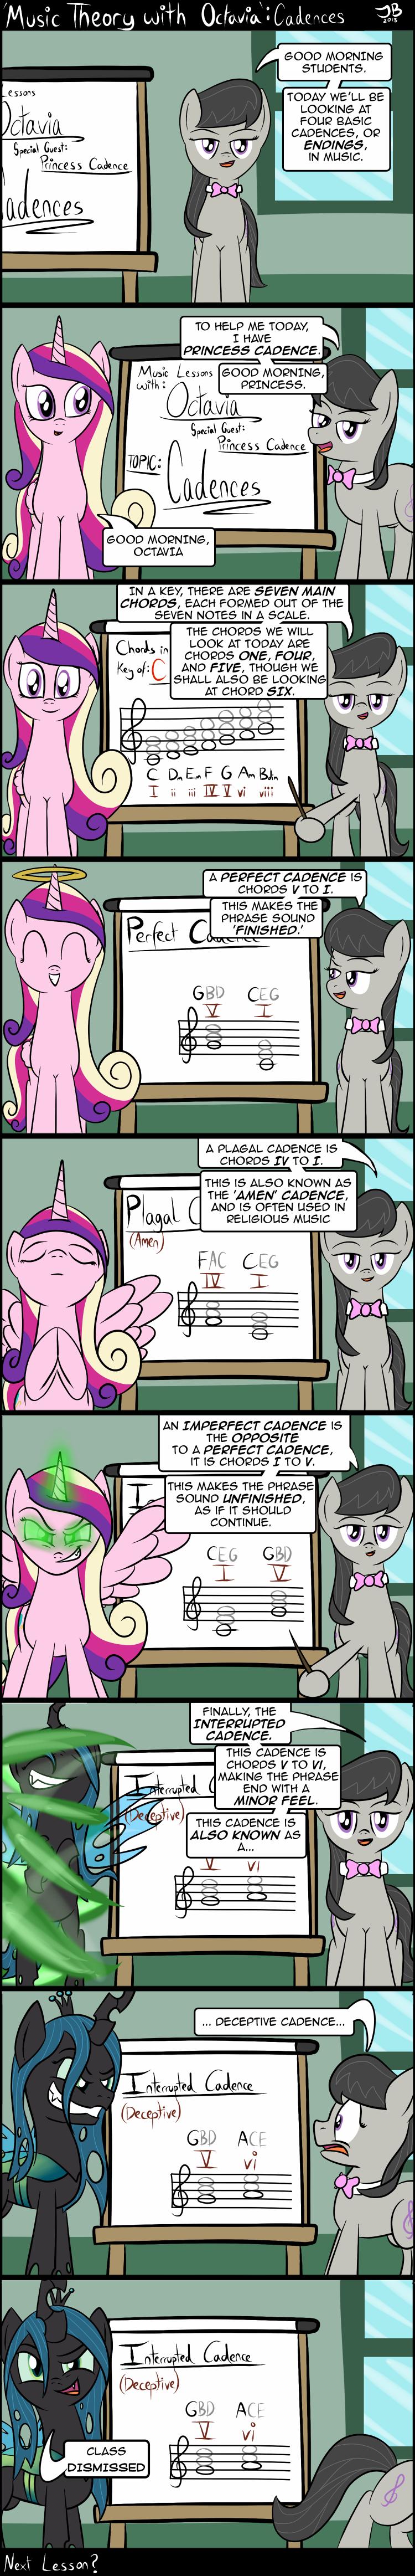 Music Theory with Octavia. Music Theory with Octavia: Cadences by ~ReakkorShrike.. That was pretty good.